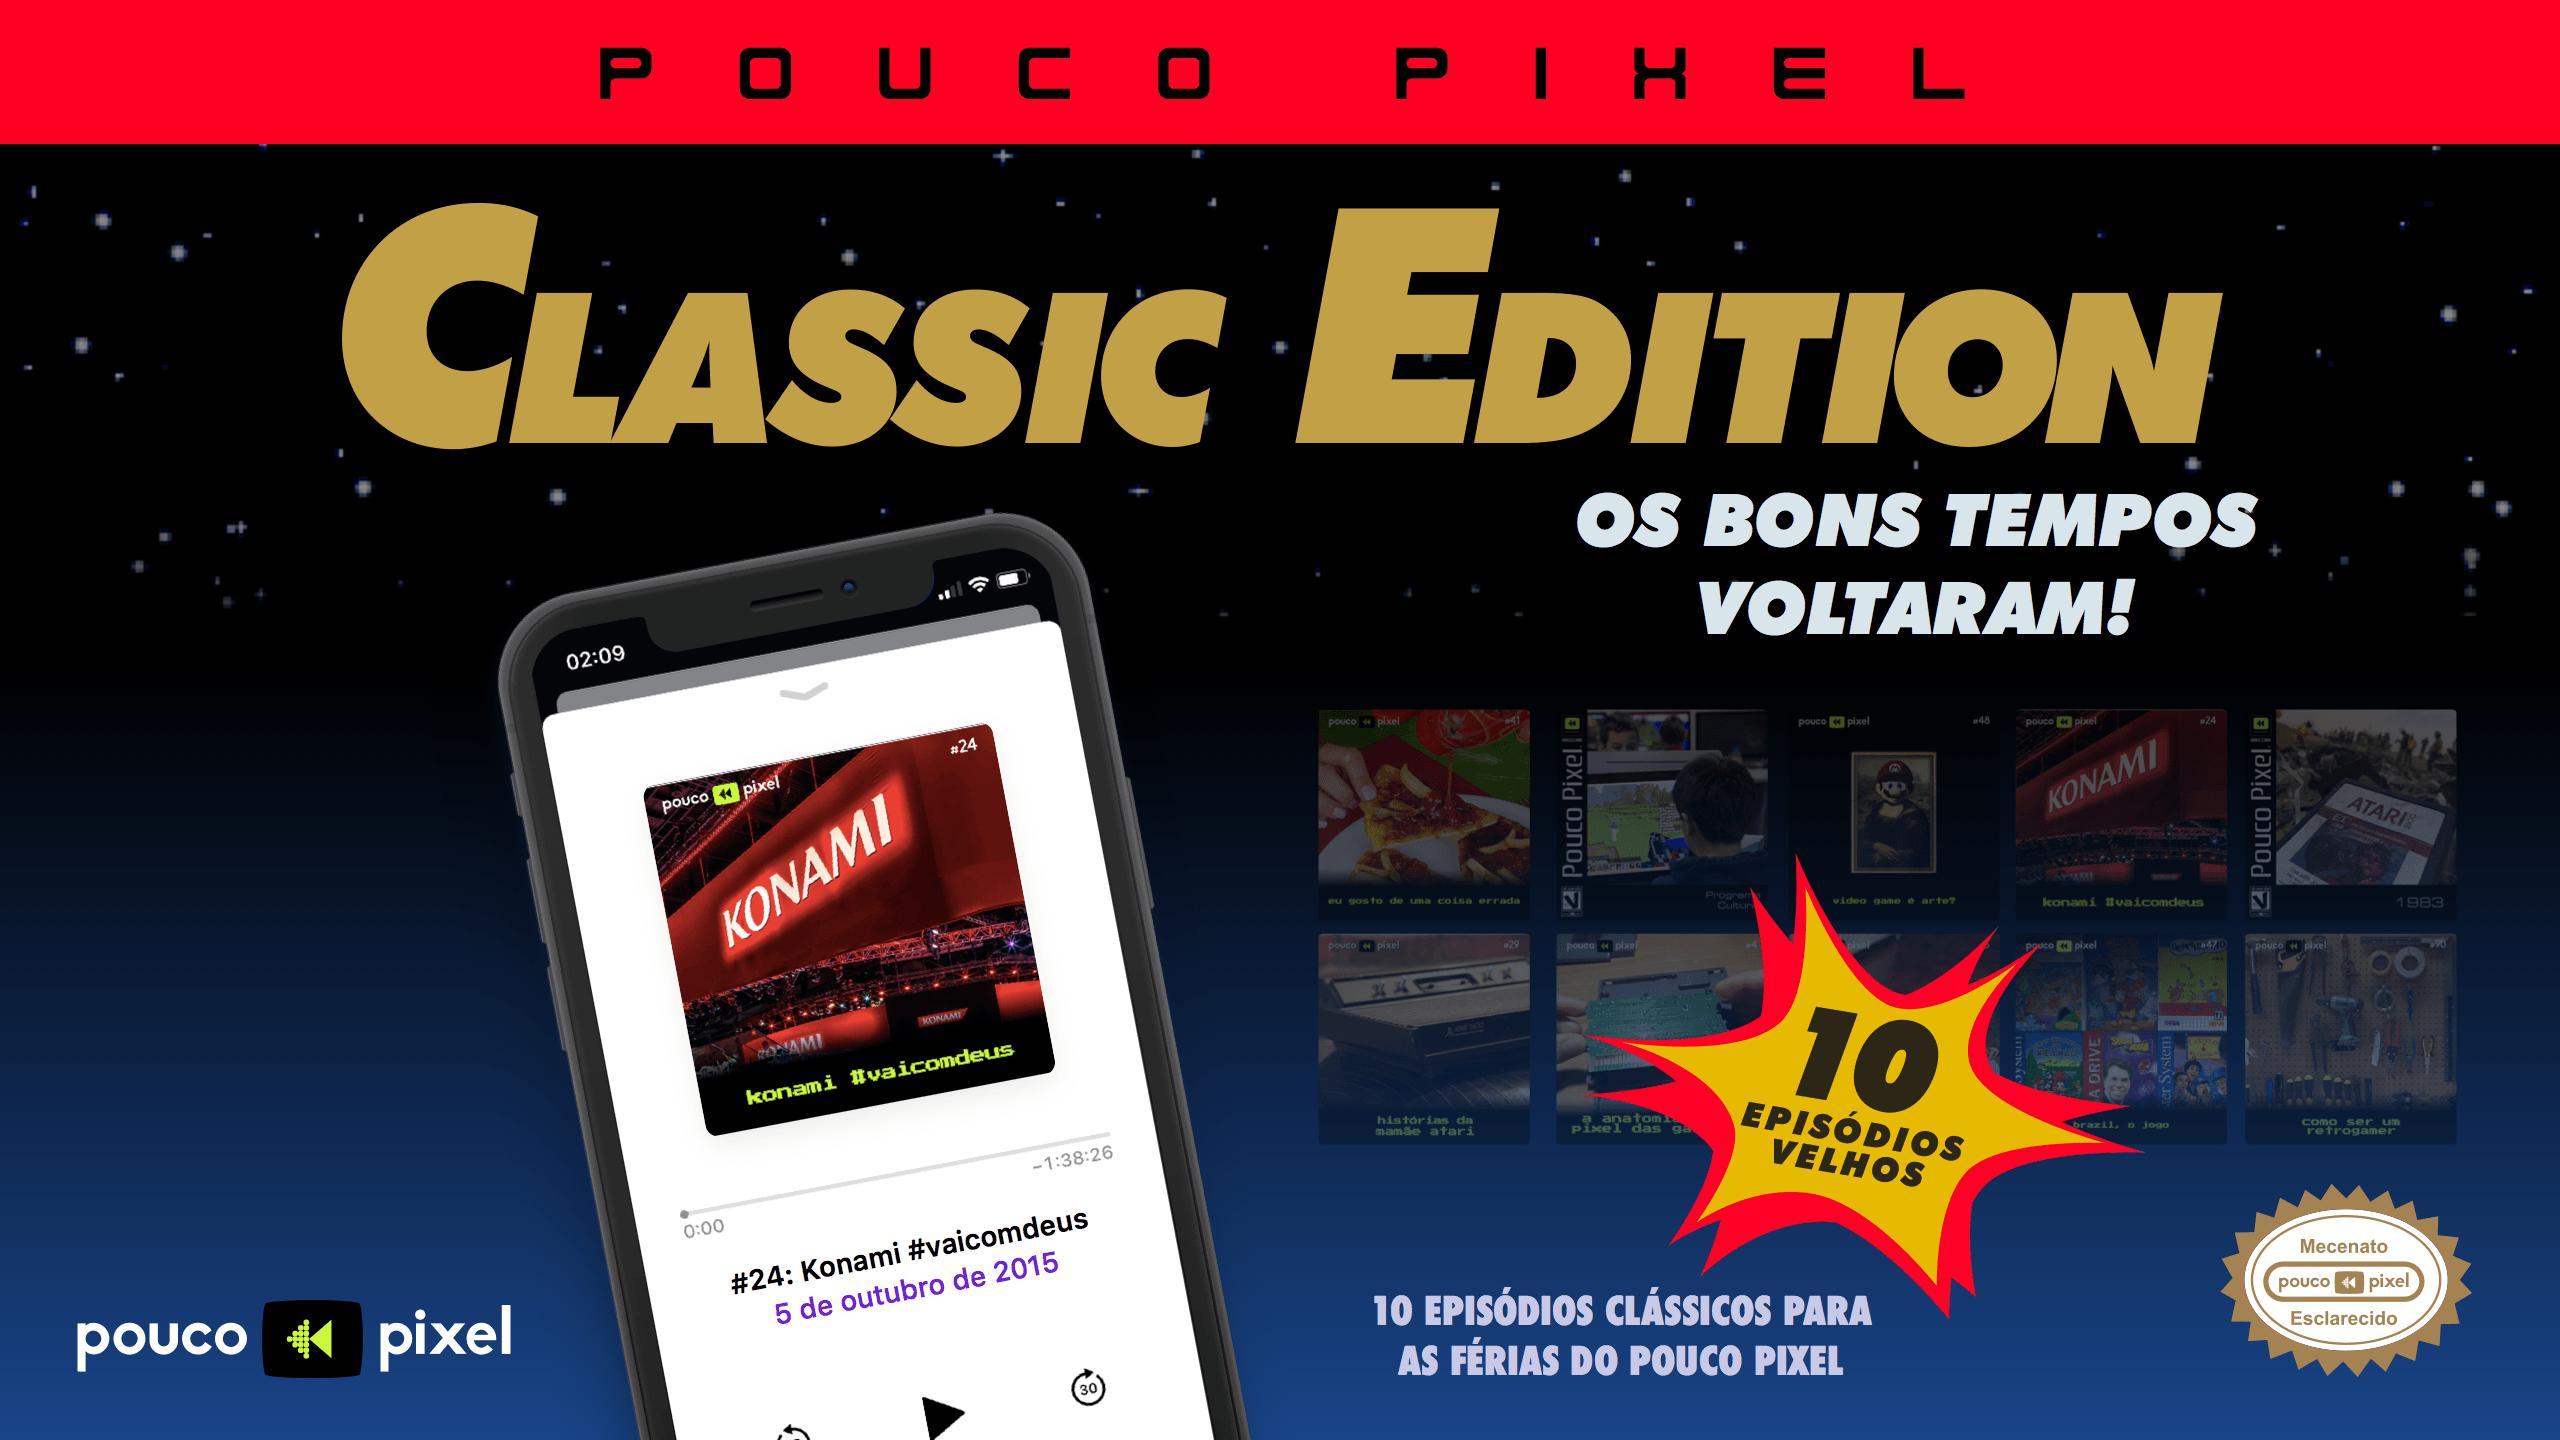 Pouco Pixel Classic Edition 4 – Konami #vaicomdeus